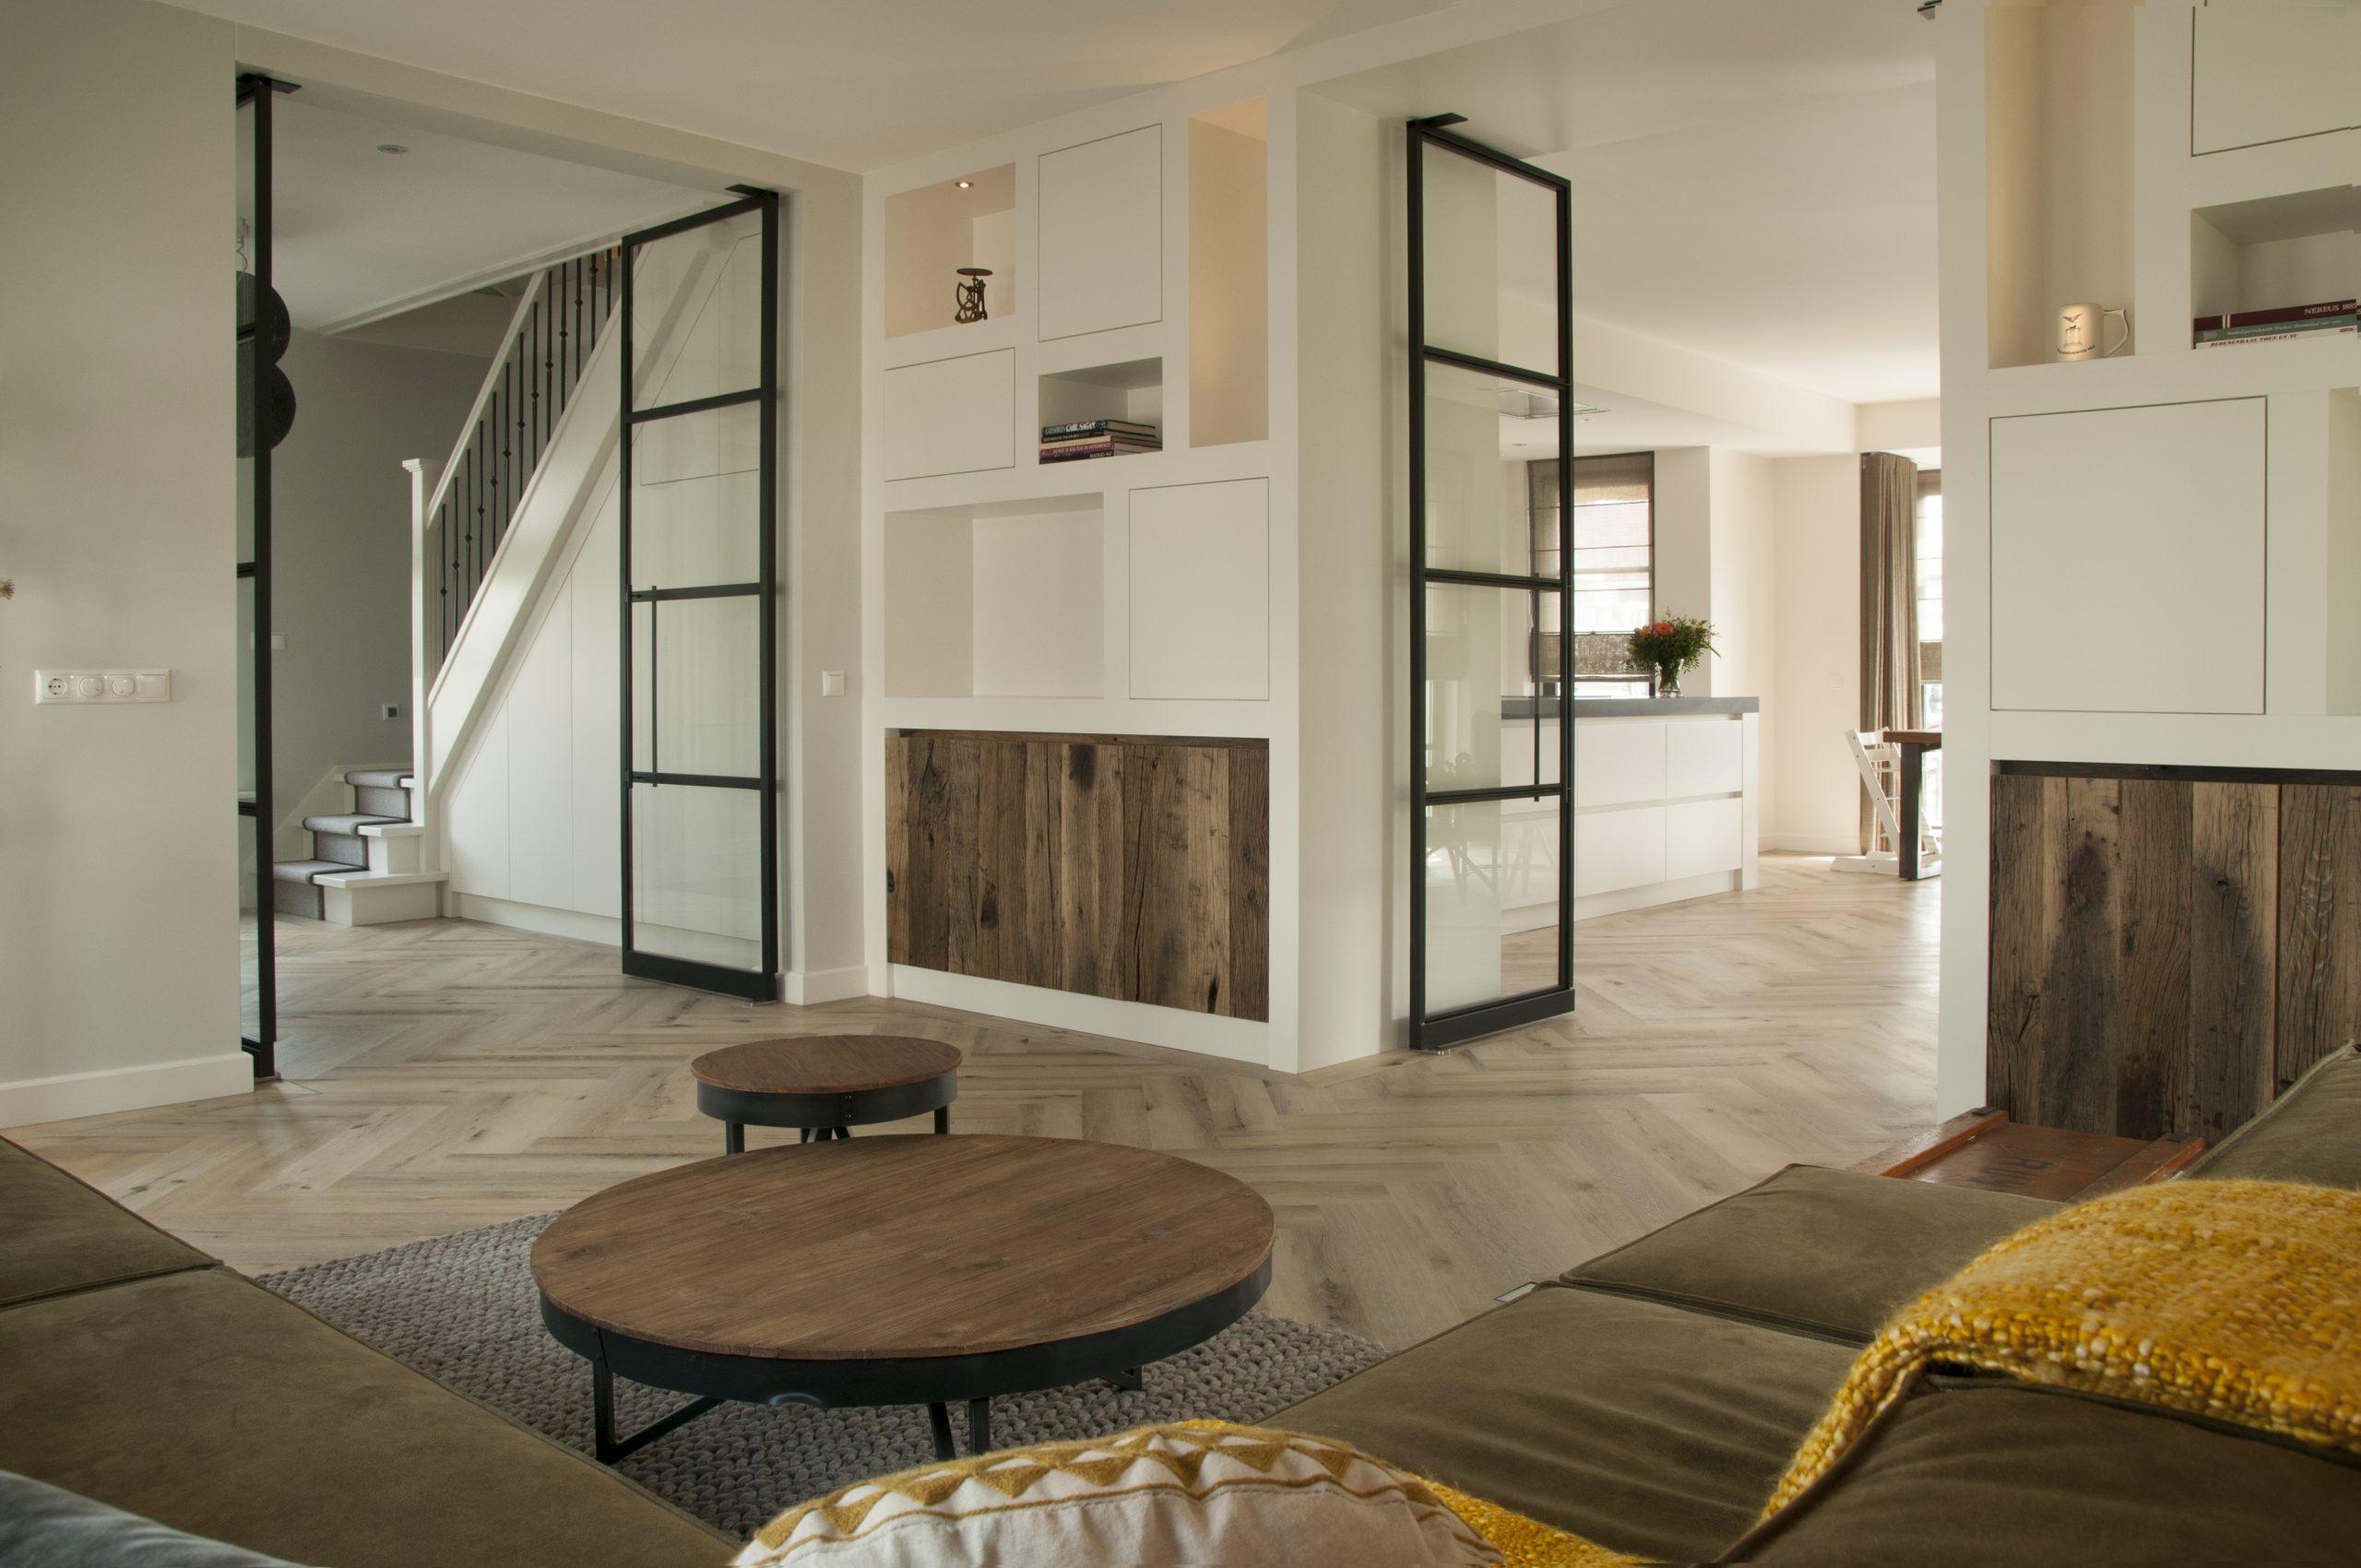 Gerealiseerde villa Boswitje te Oegstgeest - Architectuurwonen - zitkamer